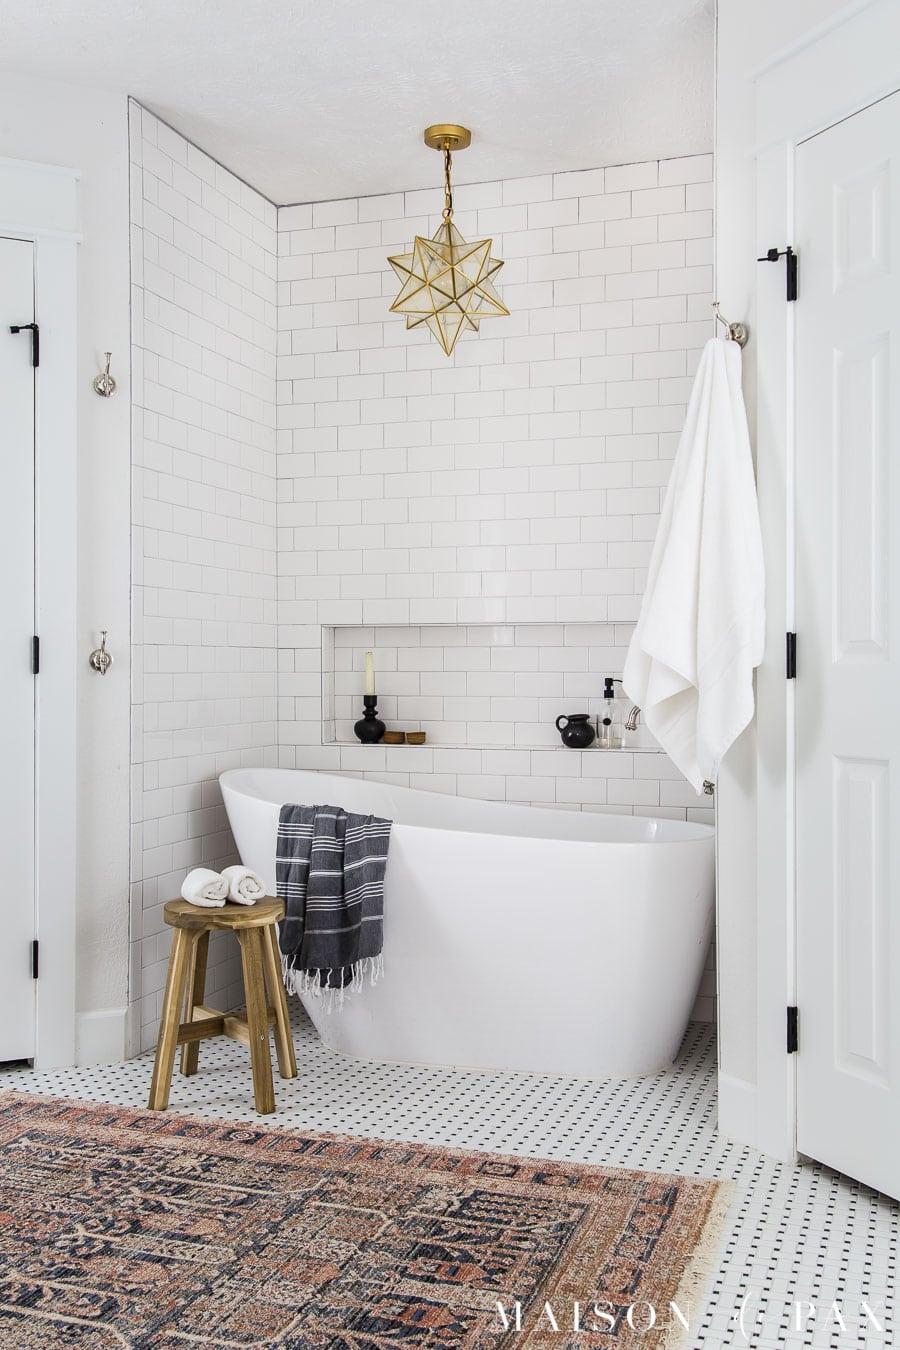 freestanding slipper tub in tiled nook with white subway tile